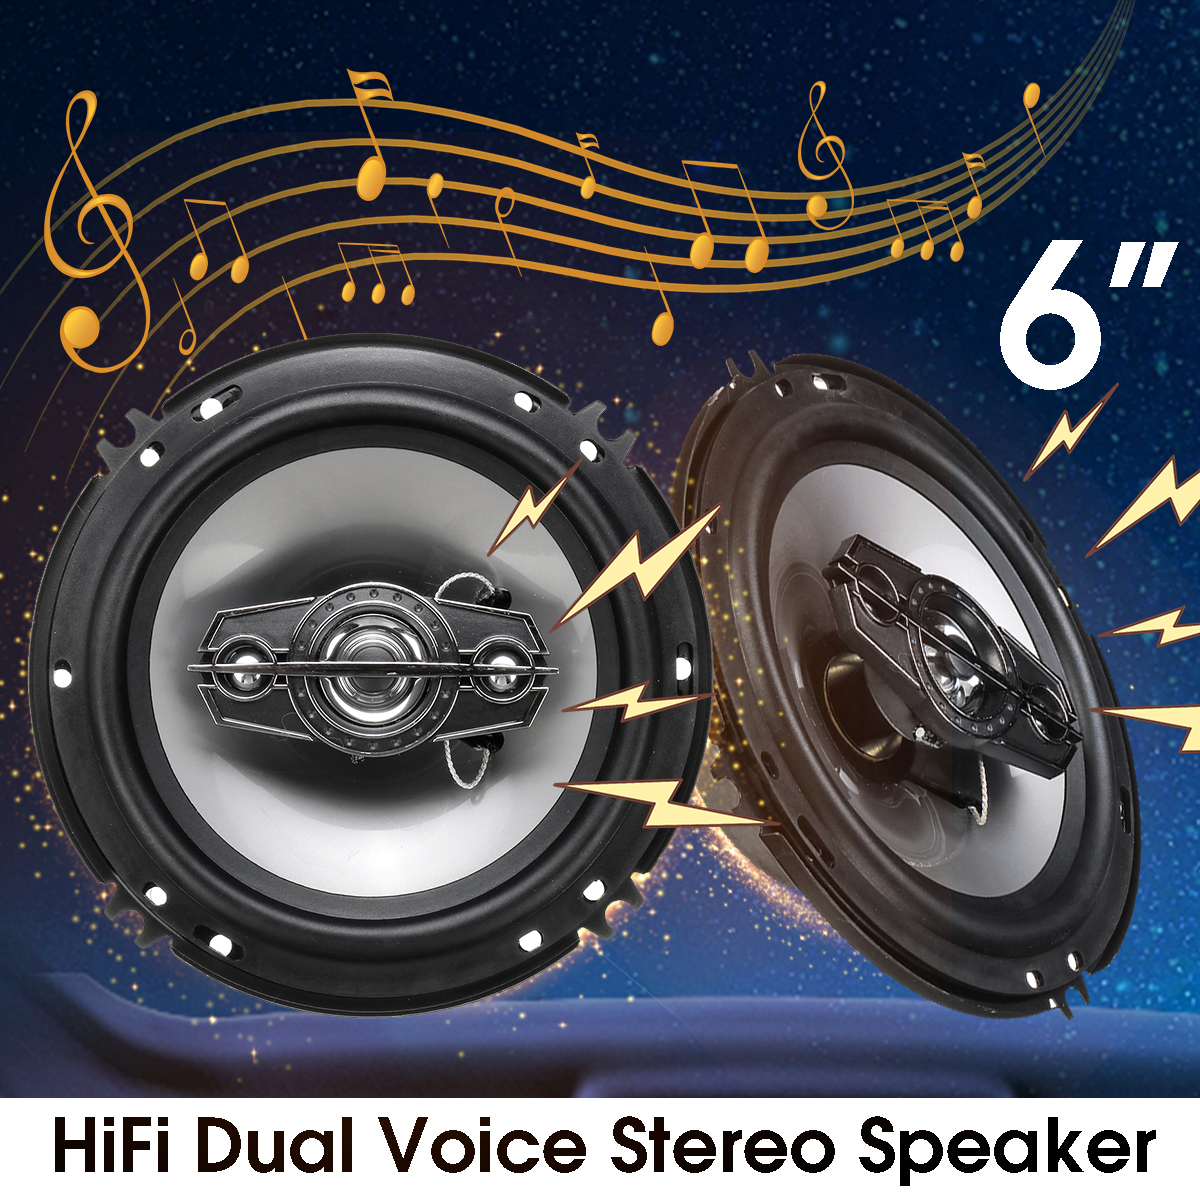 2 Pcs 6 Inch 500W Auto Audio Lautsprecher 4 Weg Koaxial Lautsprecher Universal Fahrzeug Auto Audio Musik Stereo hifi Lautsprecher